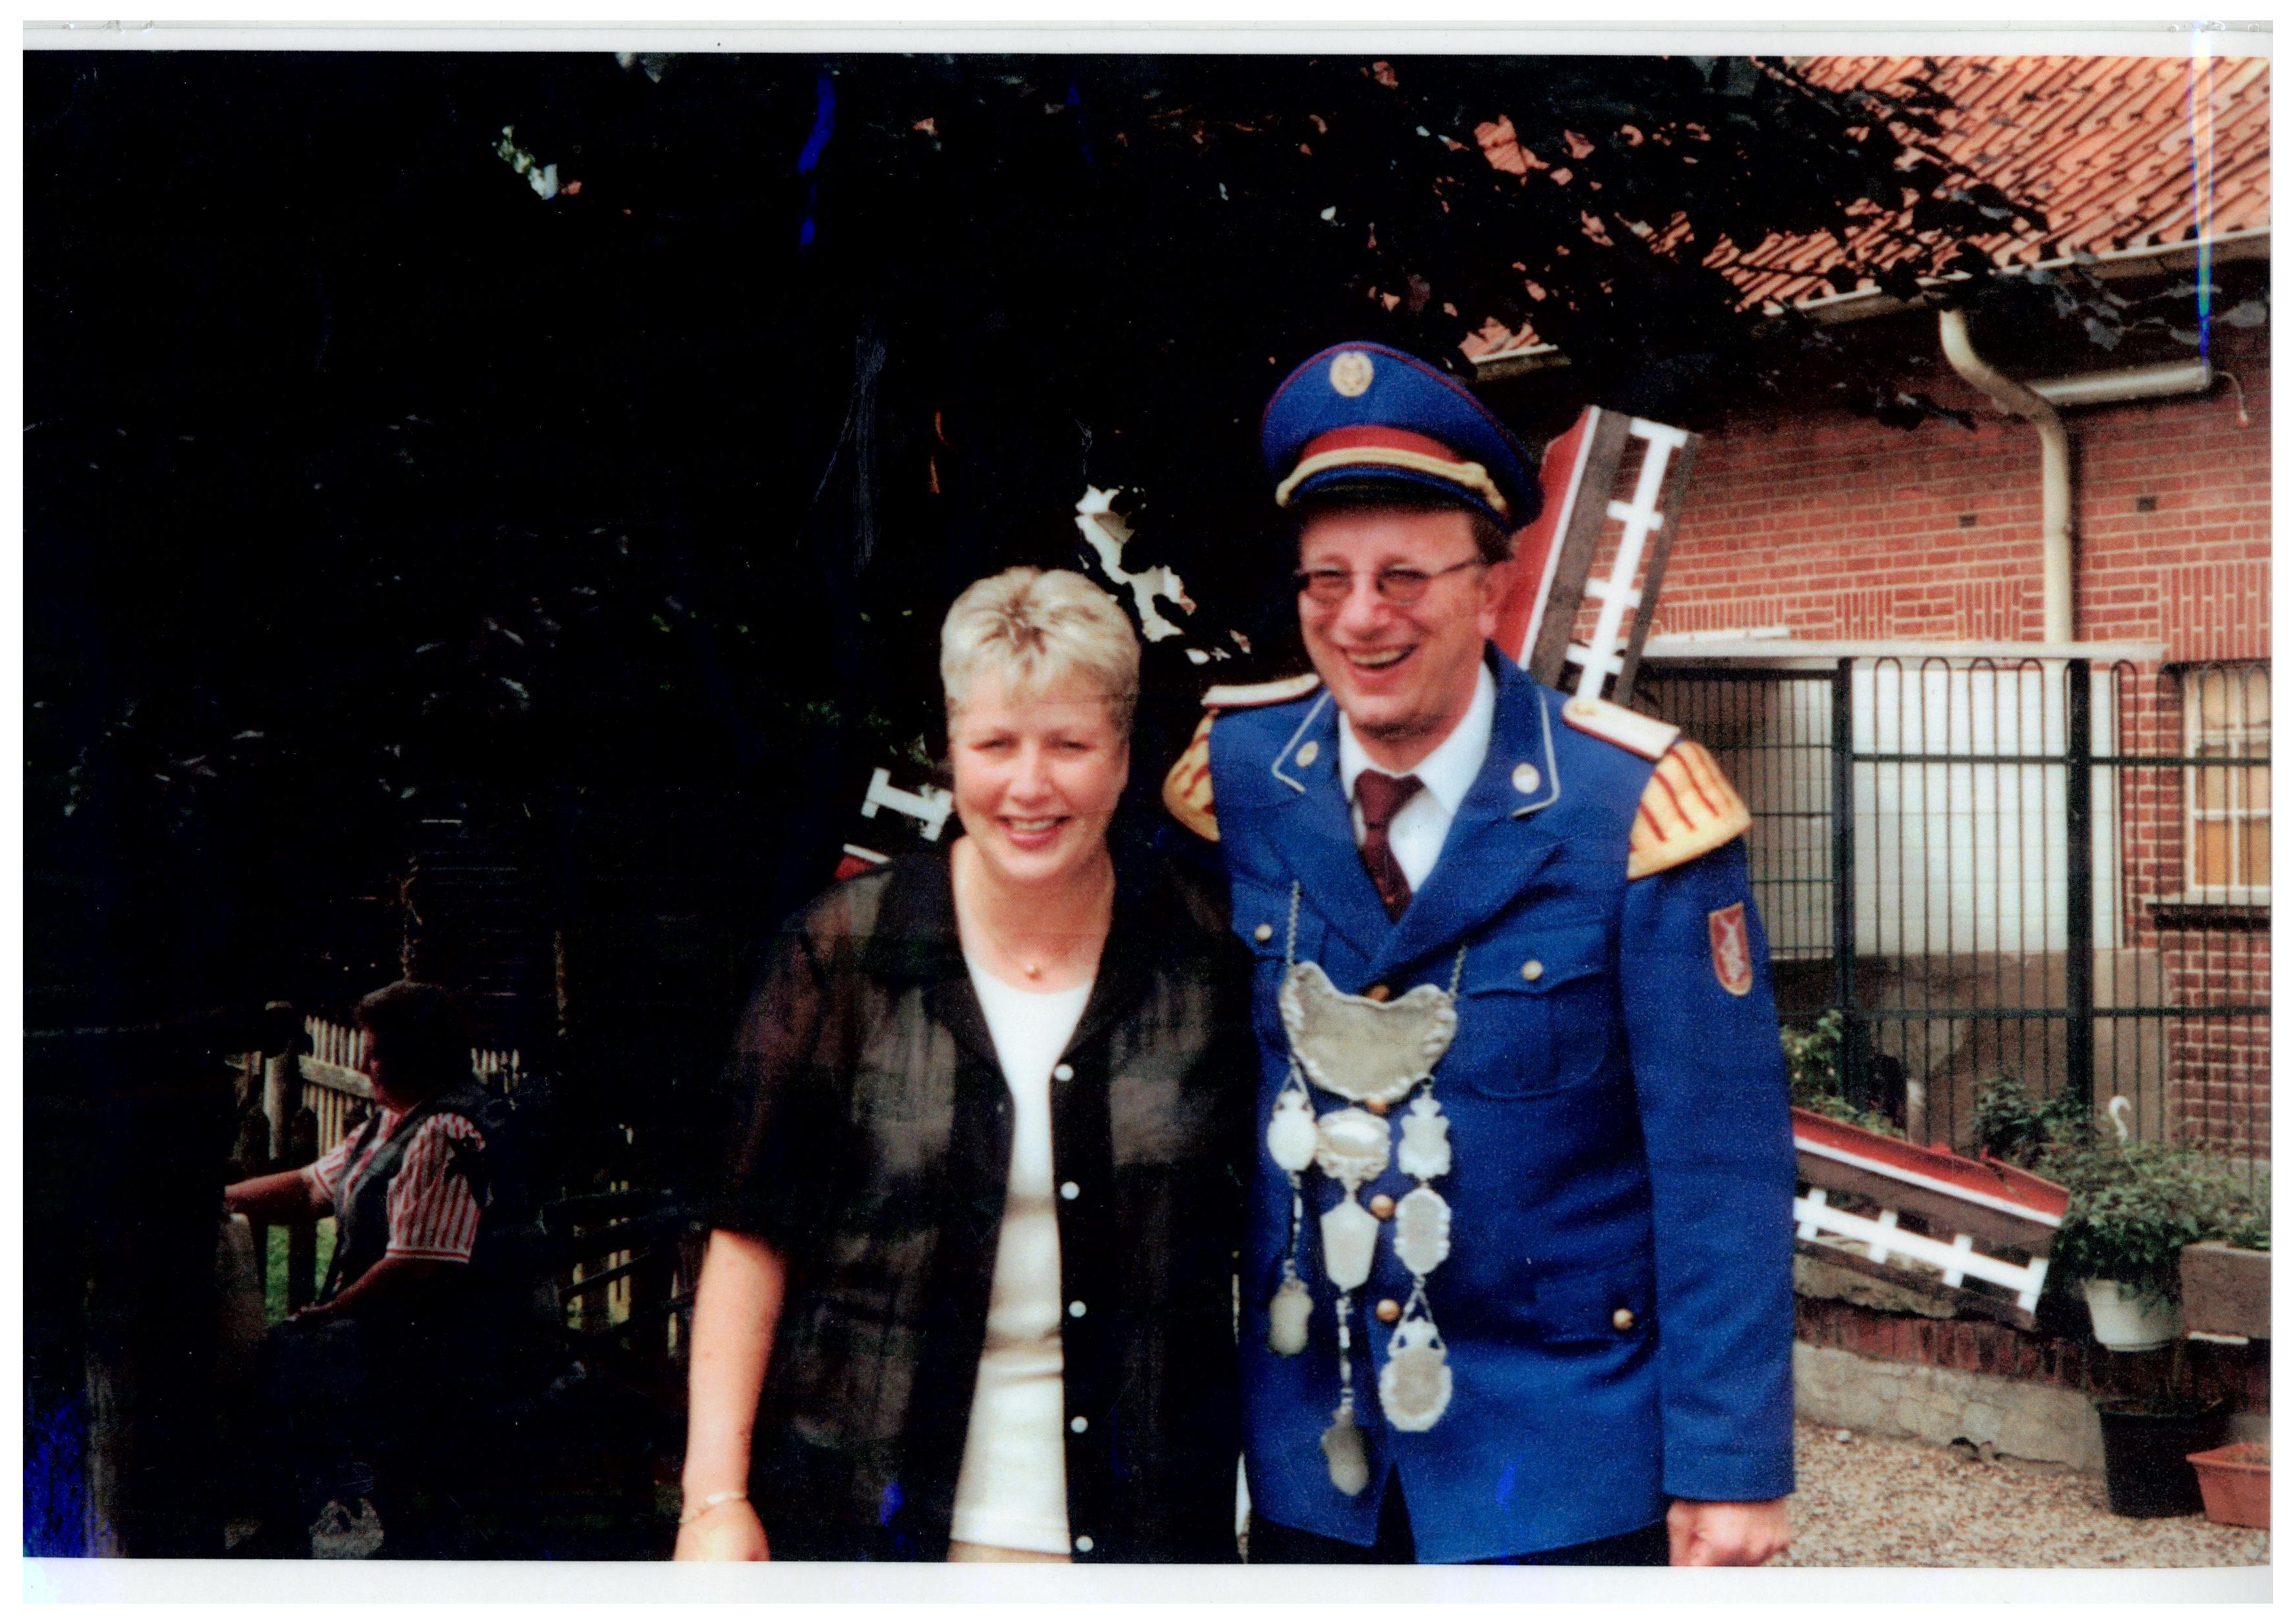 2001 - Antonius Seggewiße und Ulrike Bühs